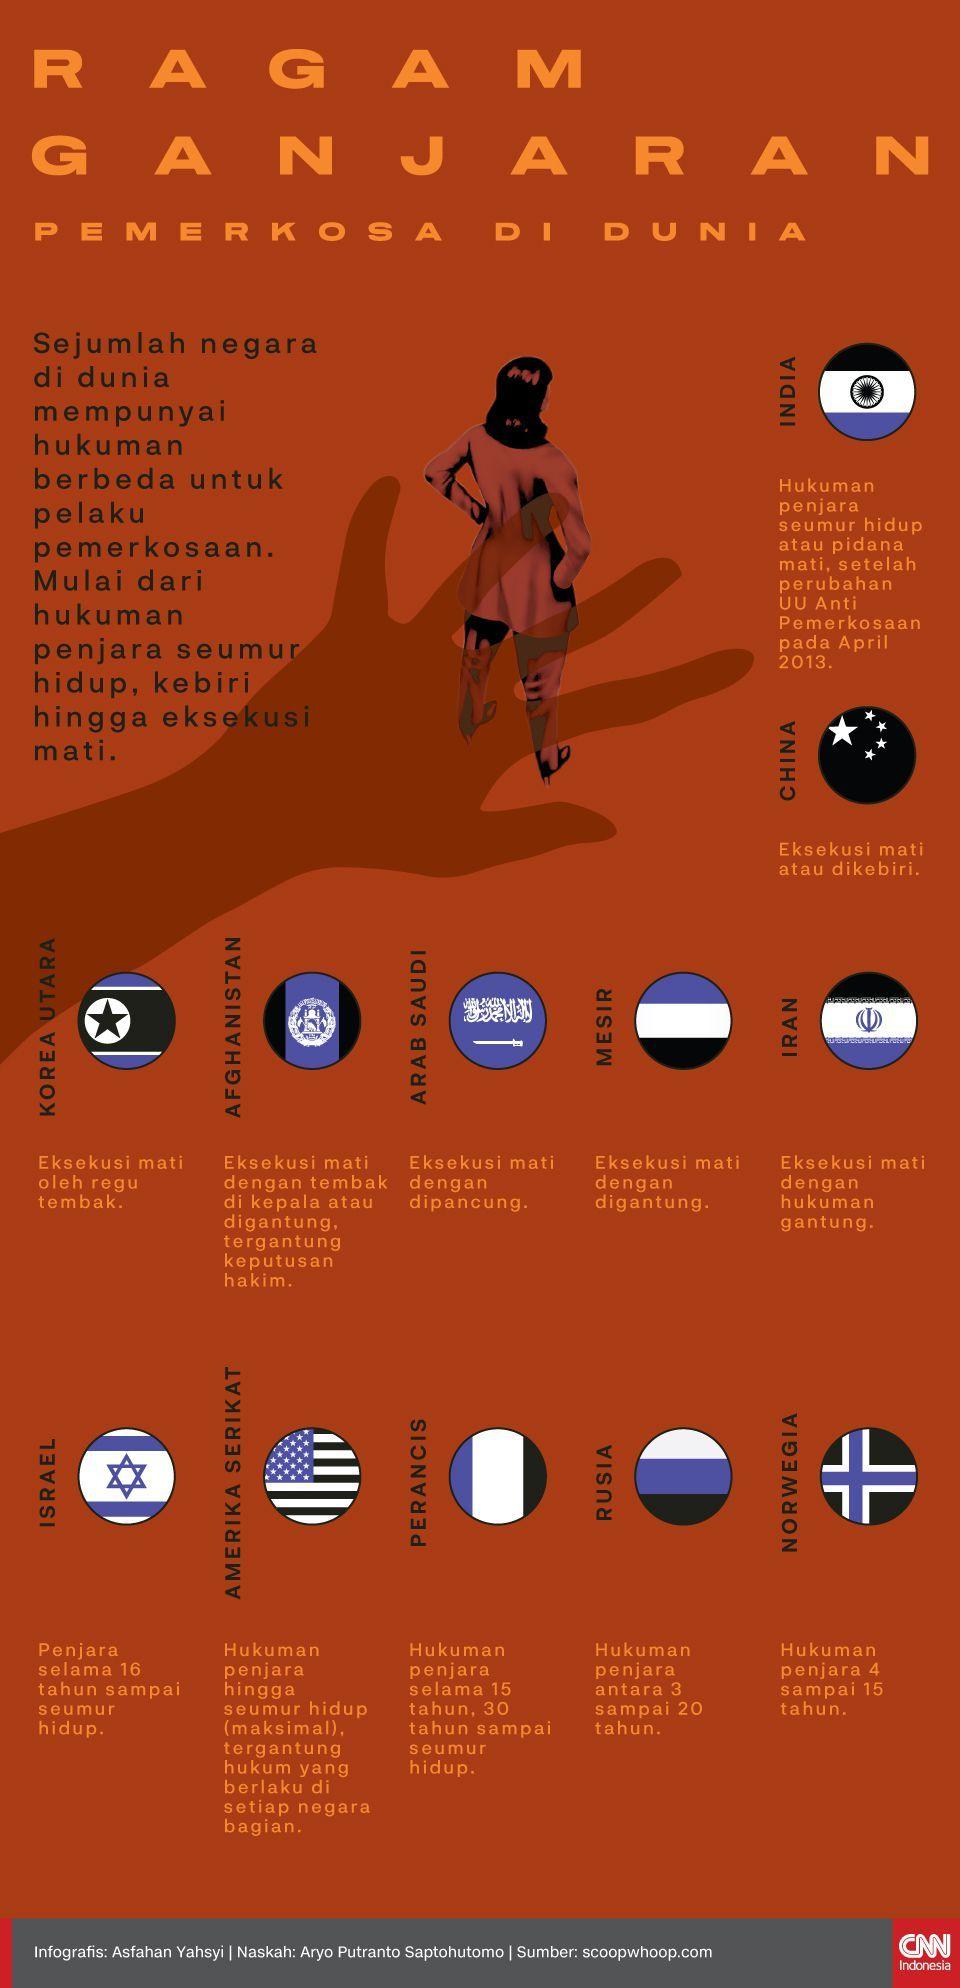 Infografis Ragam Ganjaran Pemerkosa di Dunia